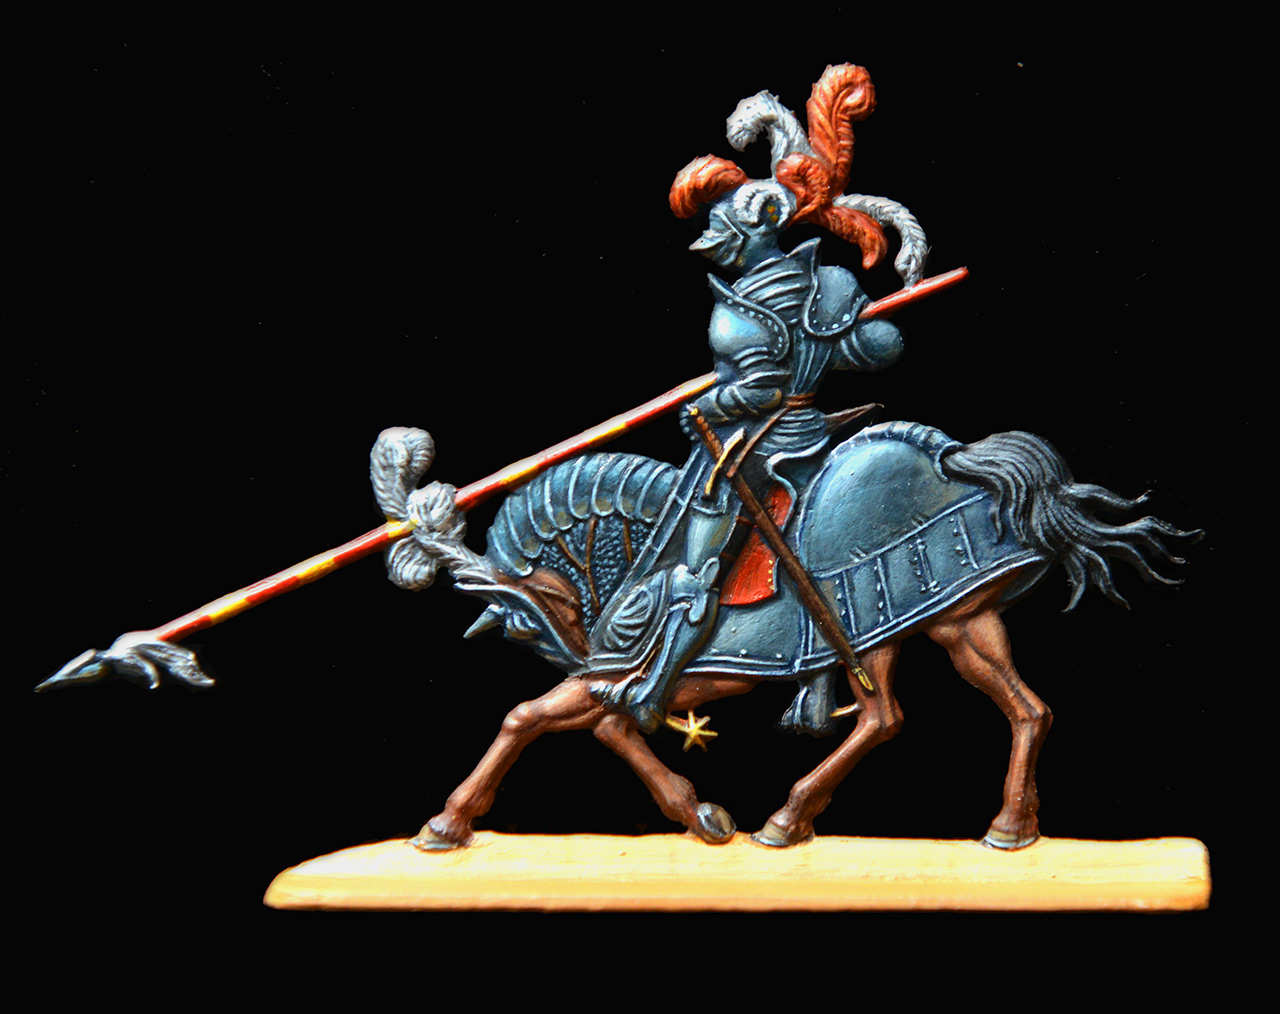 Miscellaneous: German knights, XVI cent., photo #2